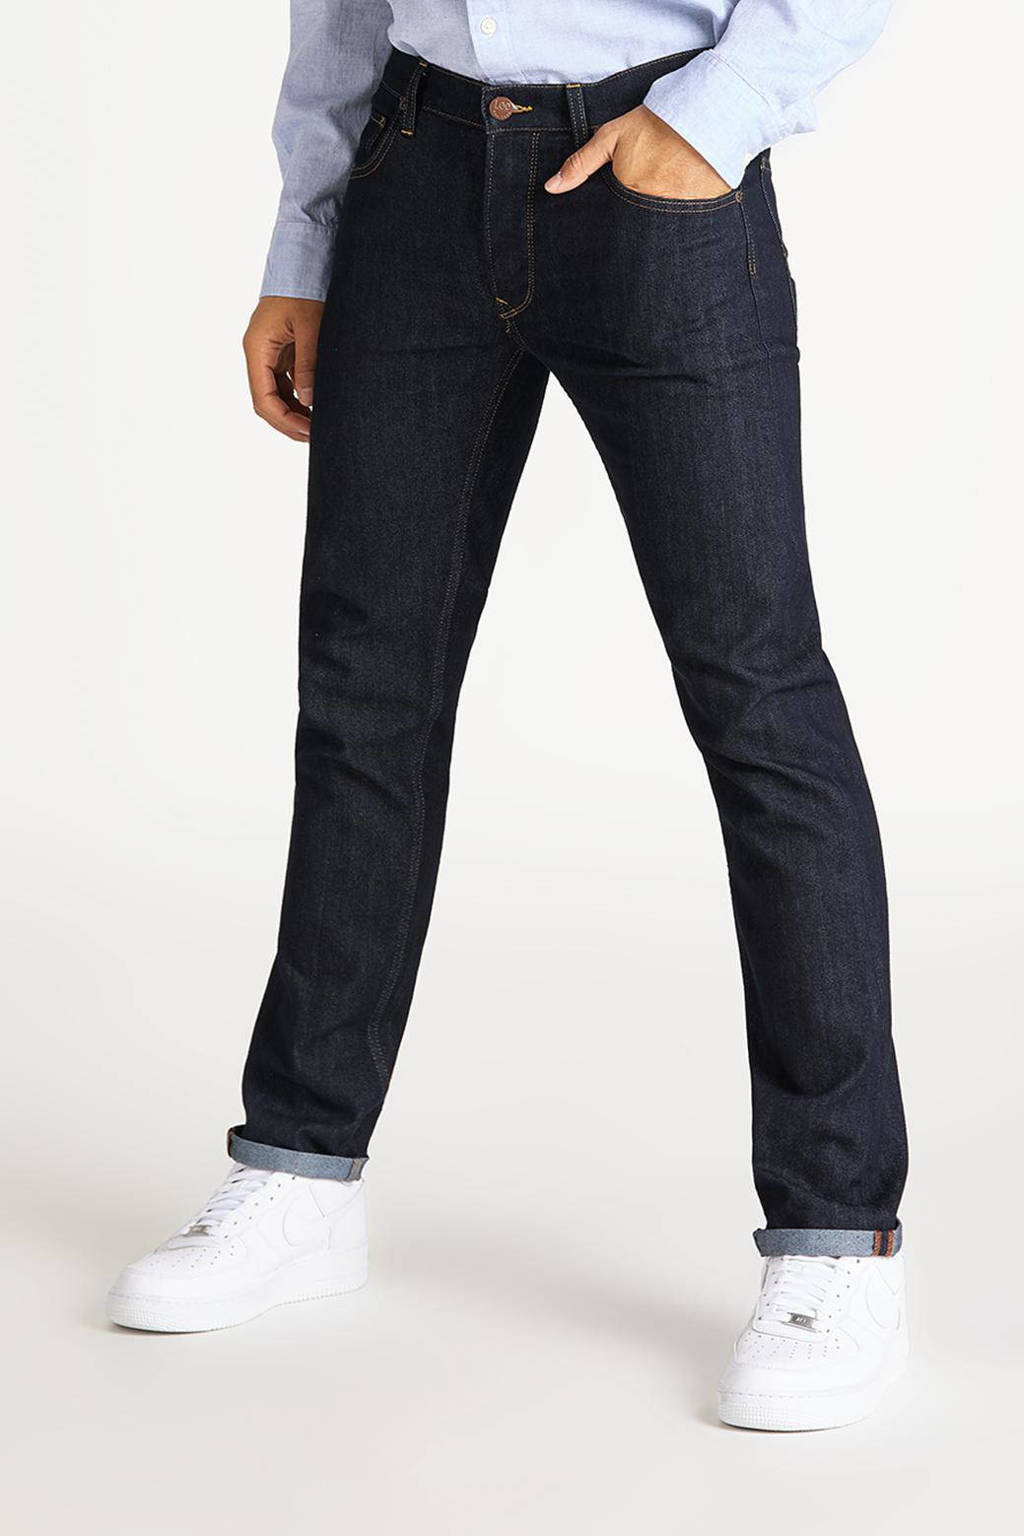 Lee regular fit jeans Daren Rinse, AA36 Rinse